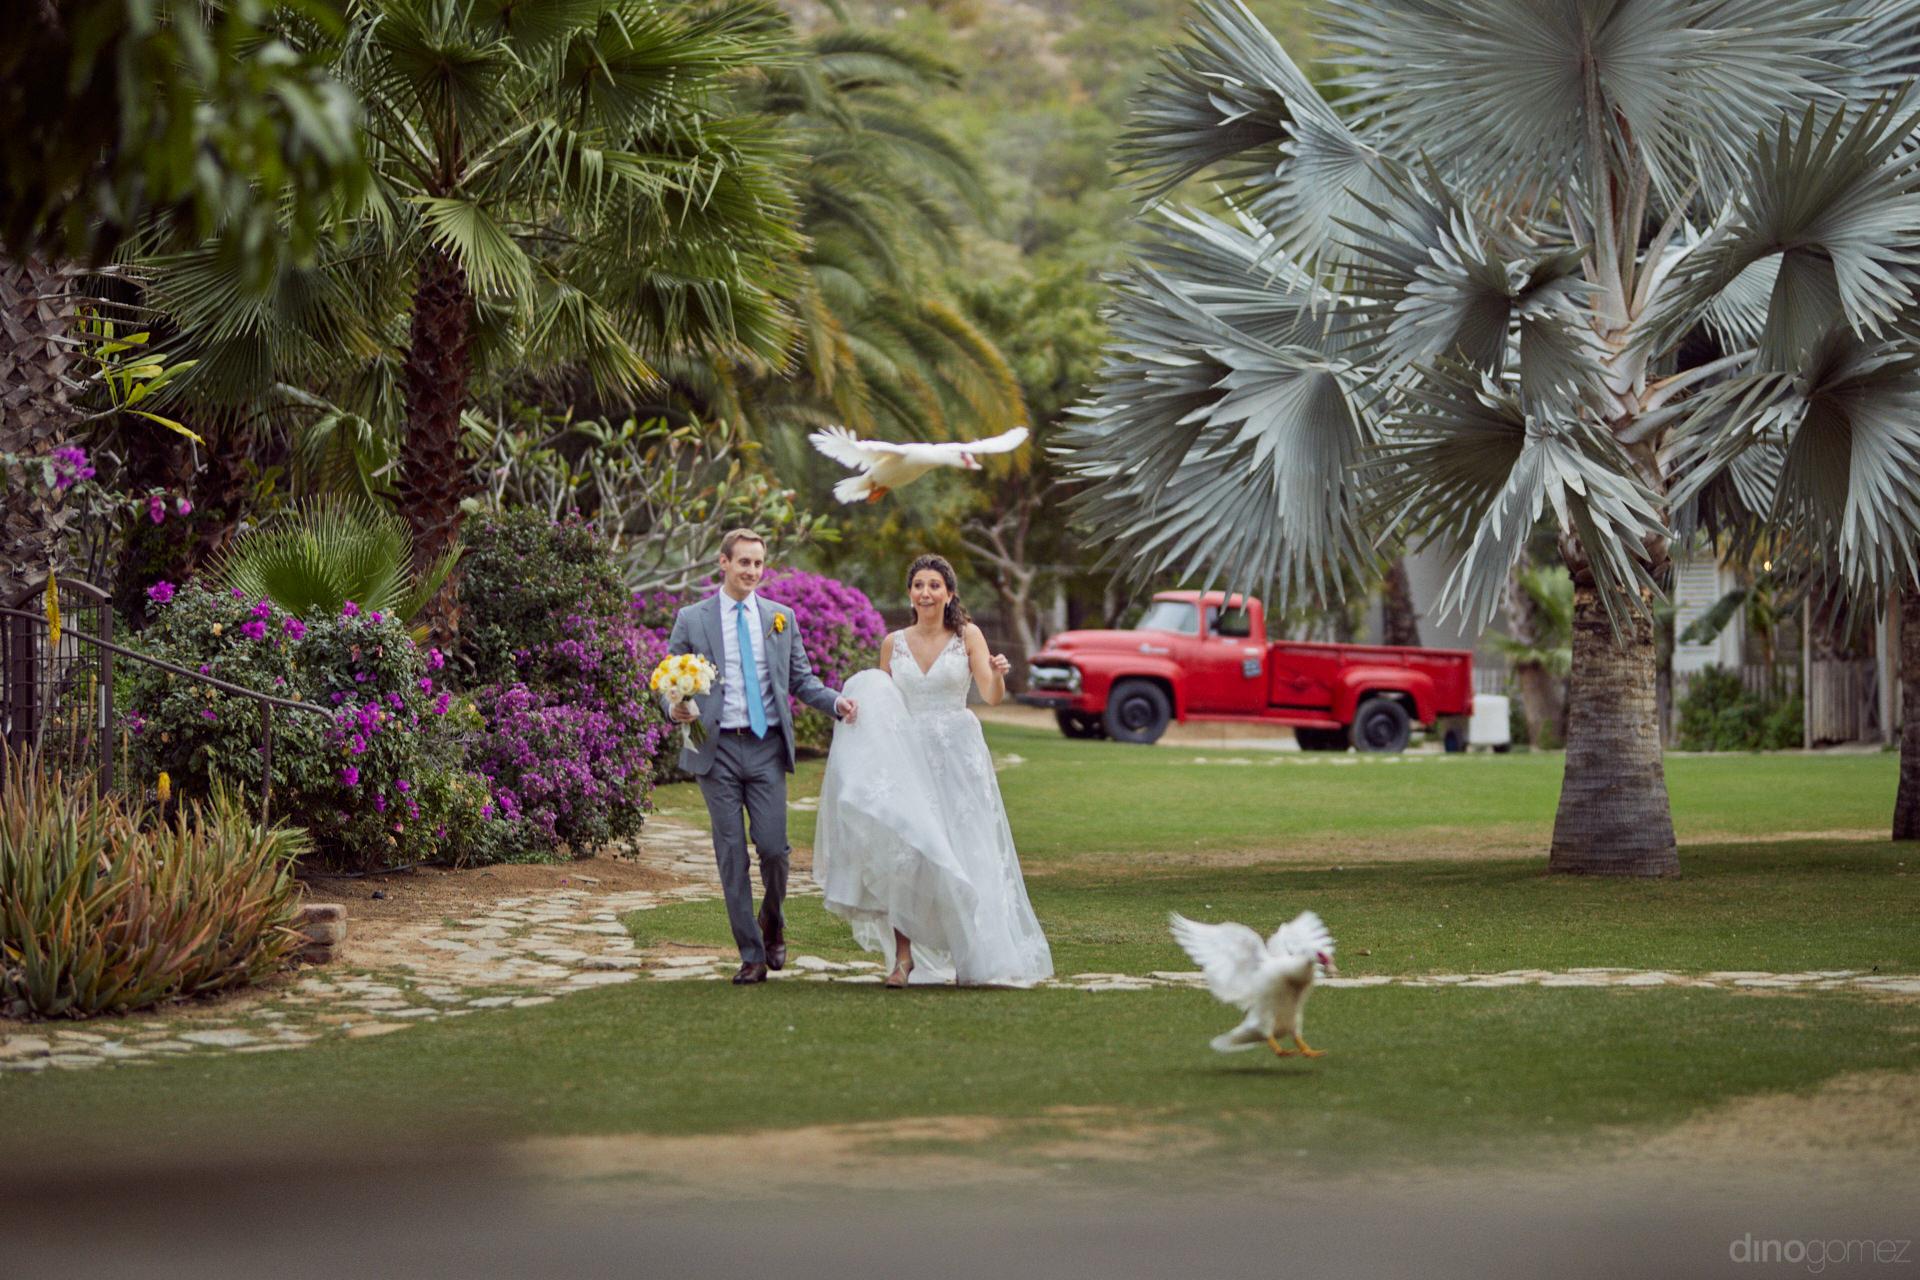 Flora Farms Rentals For Weddings - Hilary & Bryan Flora Wedding